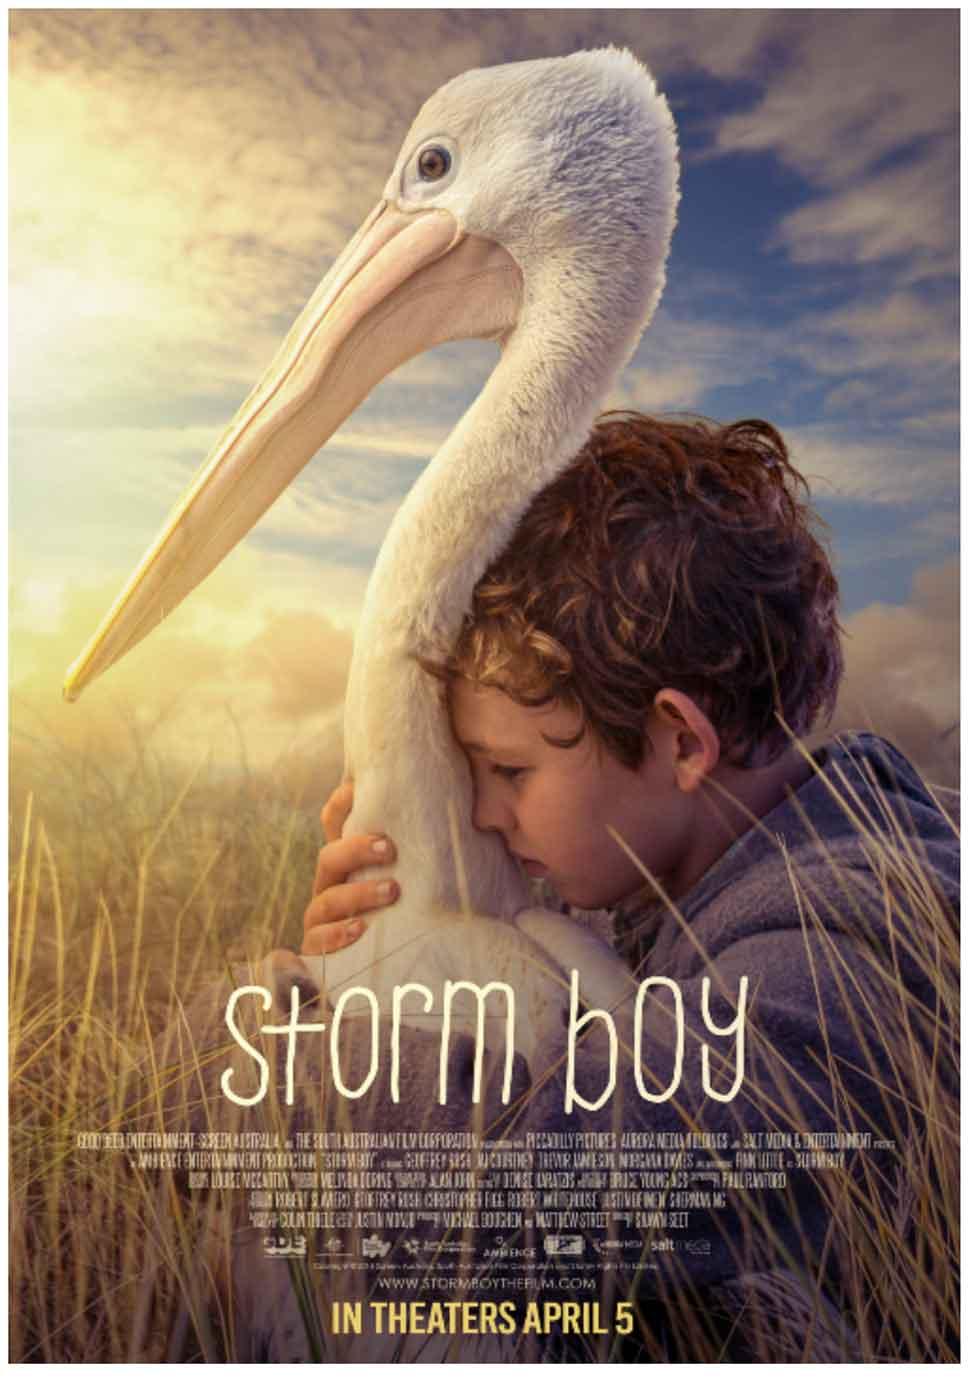 Storm Boy poster art